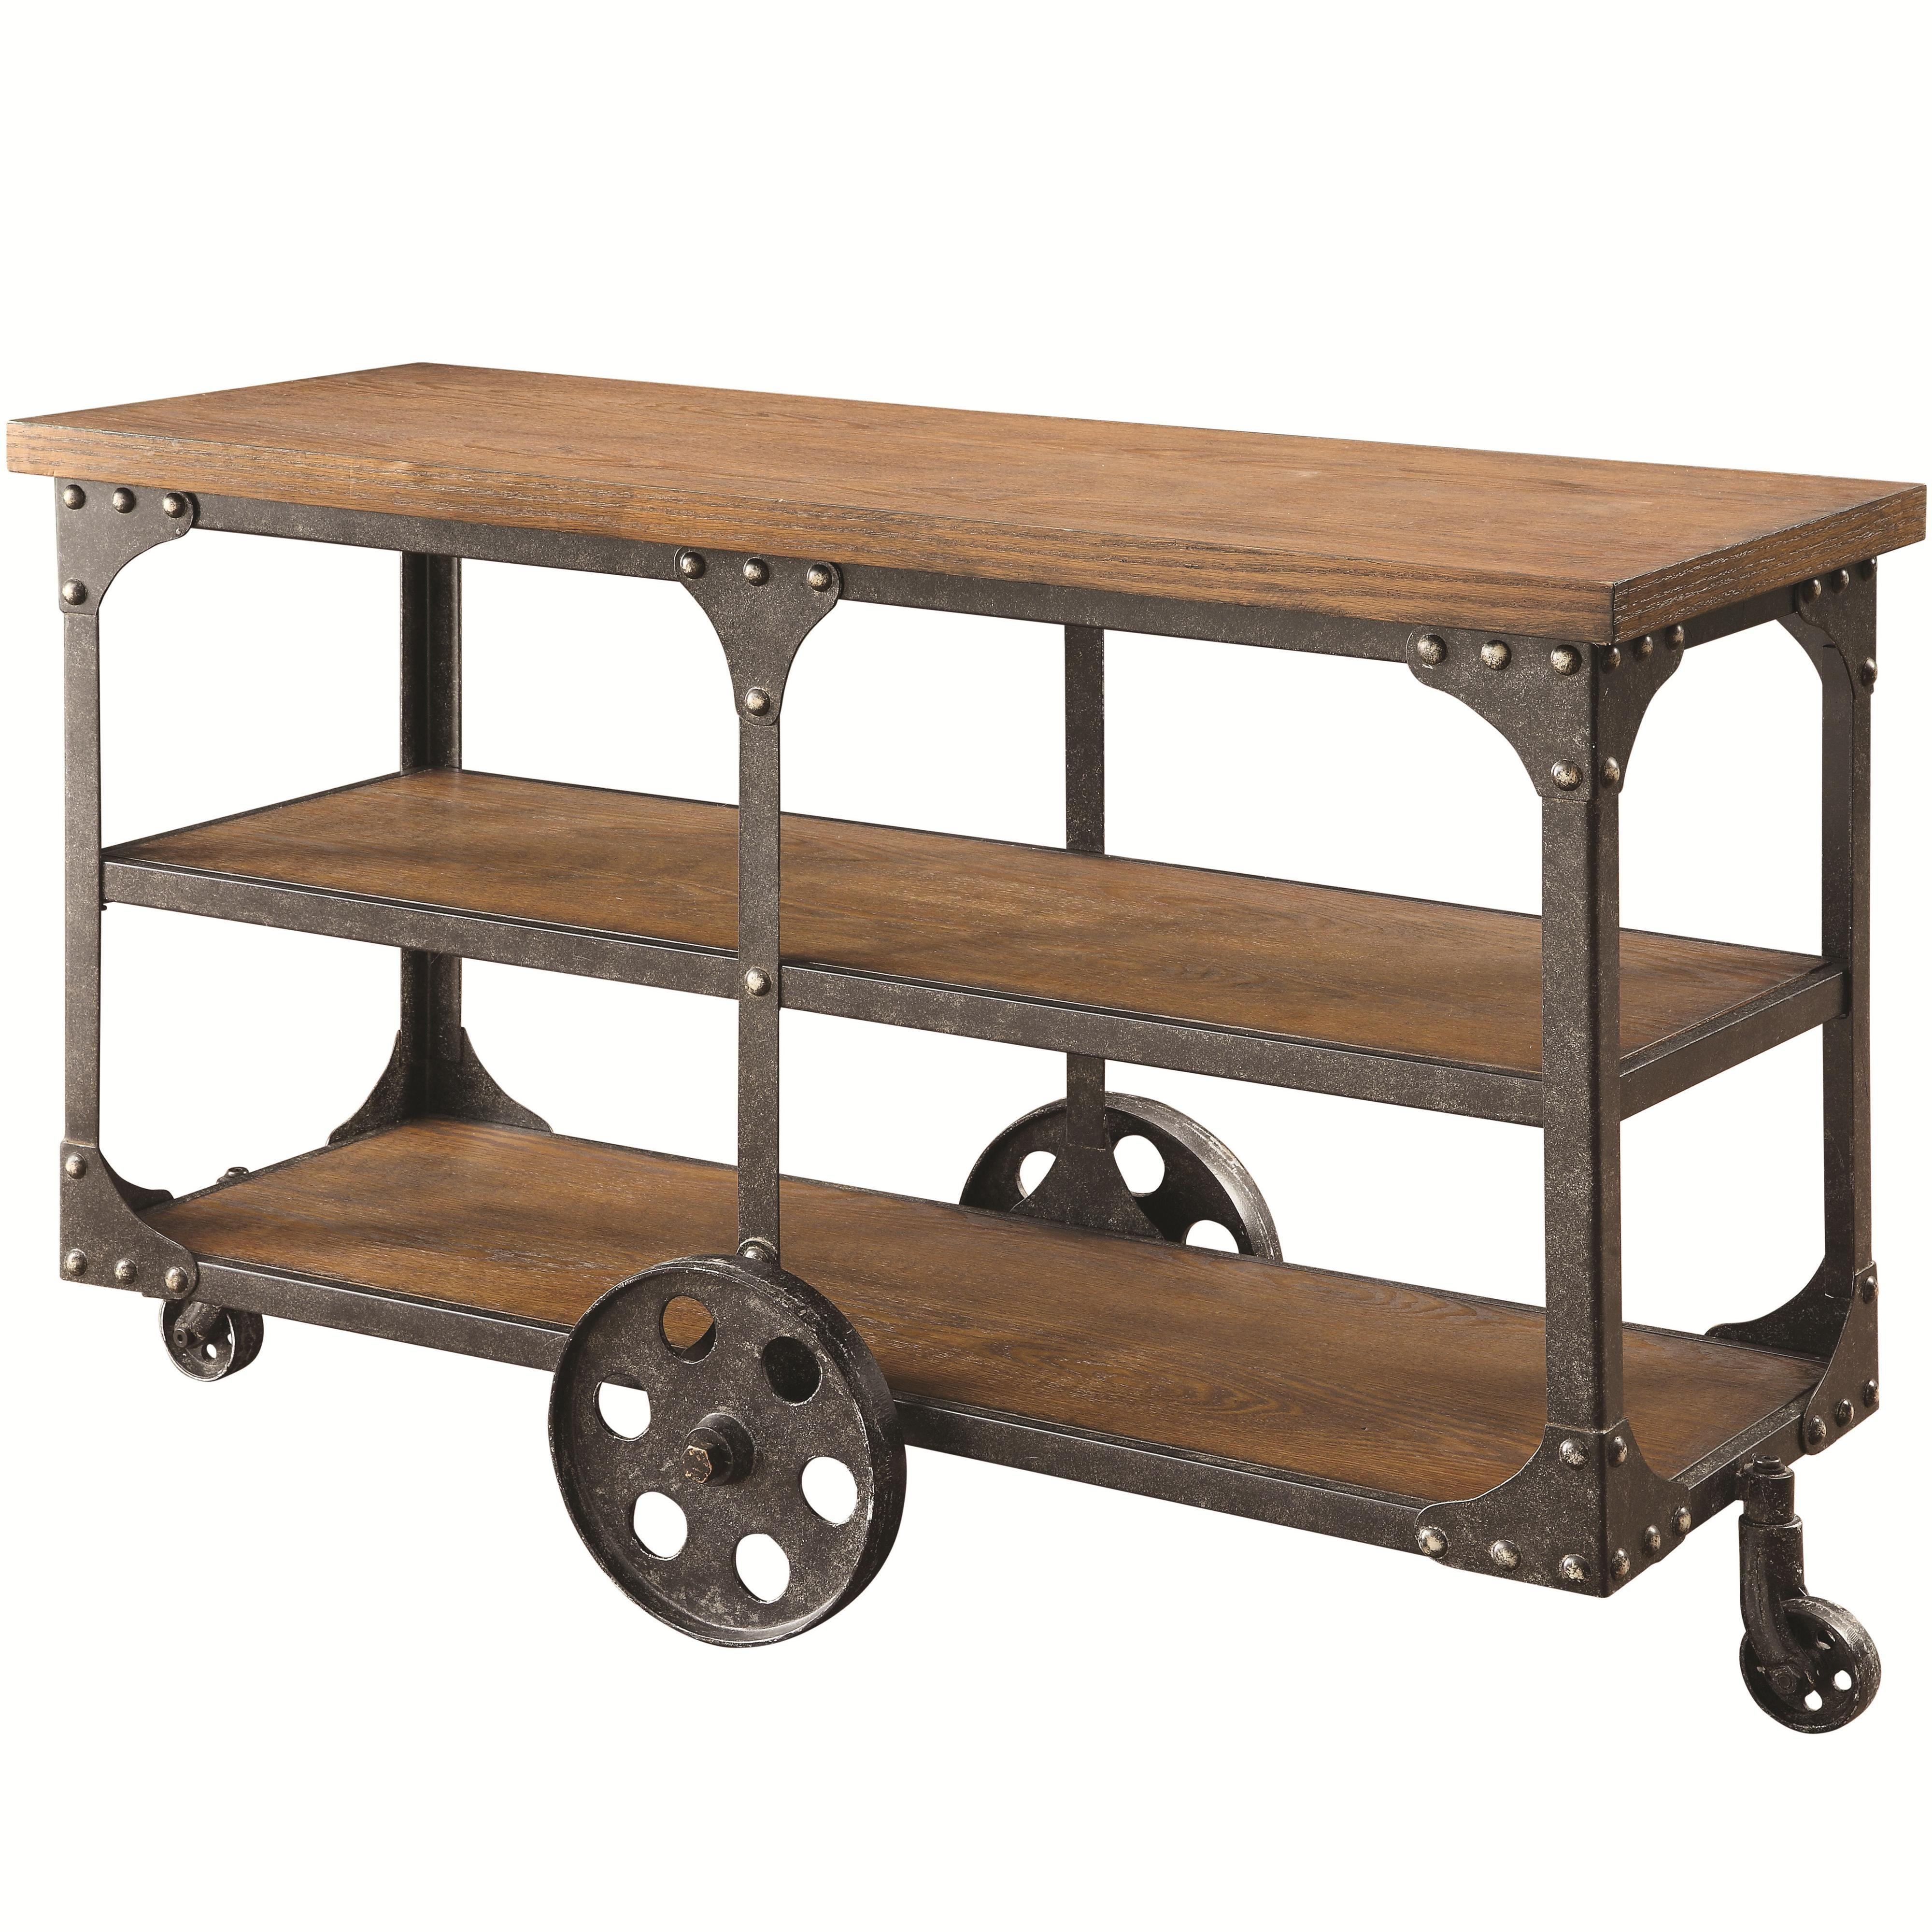 Rustic Country Brown Wood Metal Sofa Table w Shelf